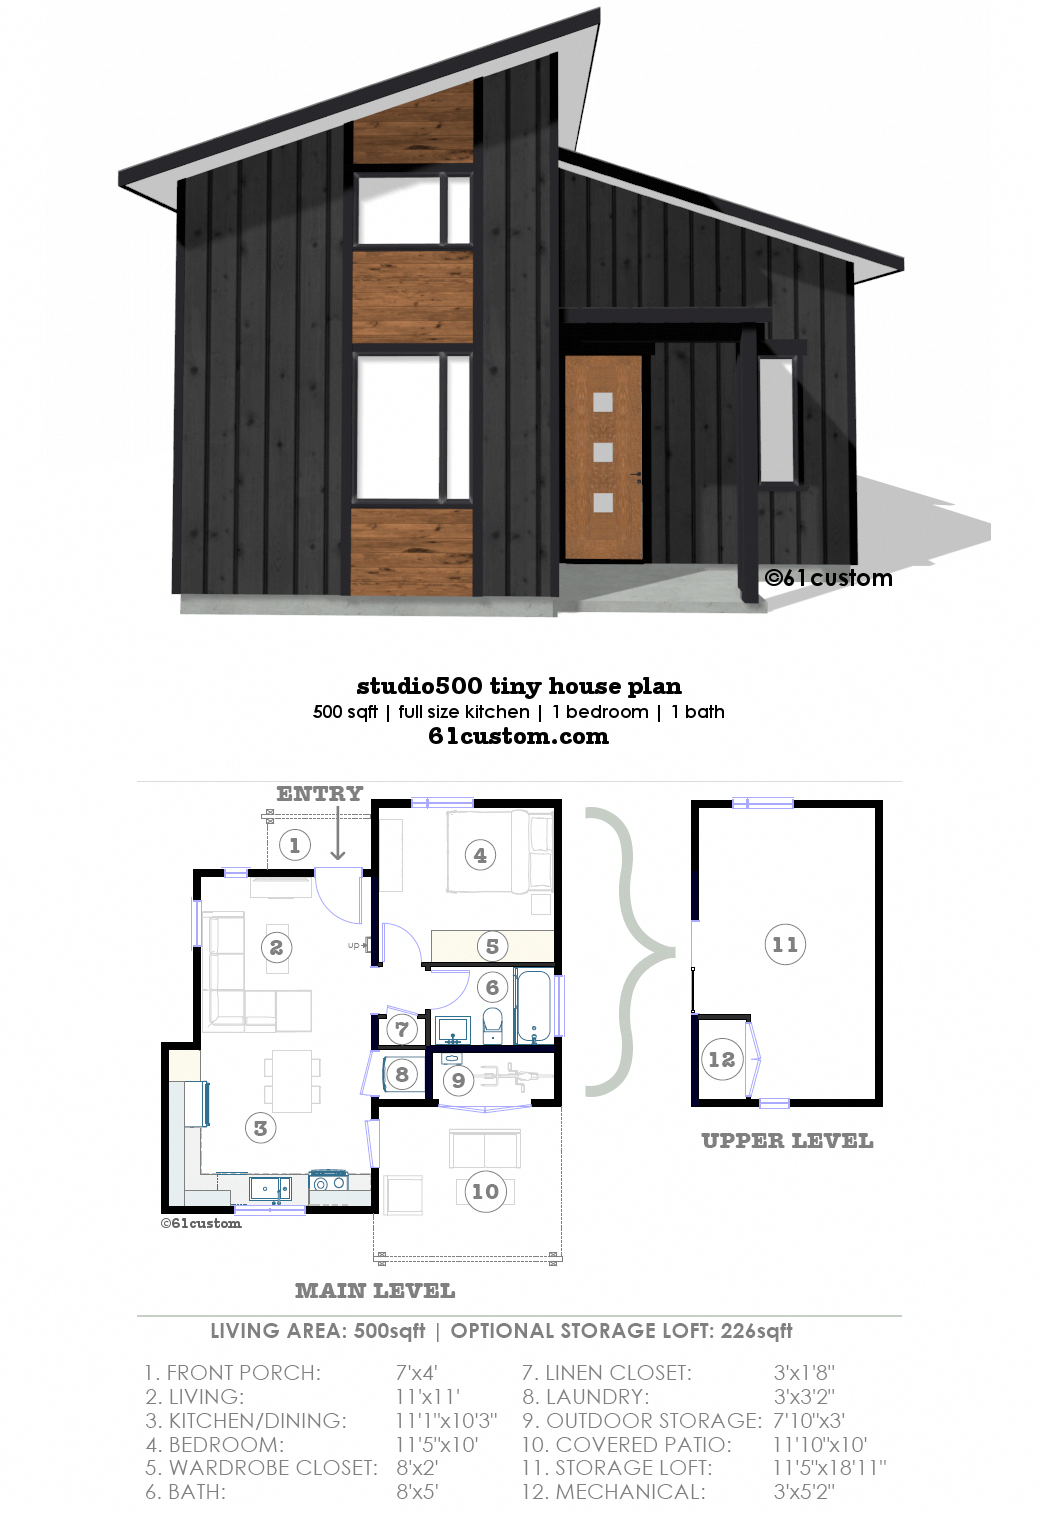 Studio500 Tiny House Plan 61custom Exteriordesignhome